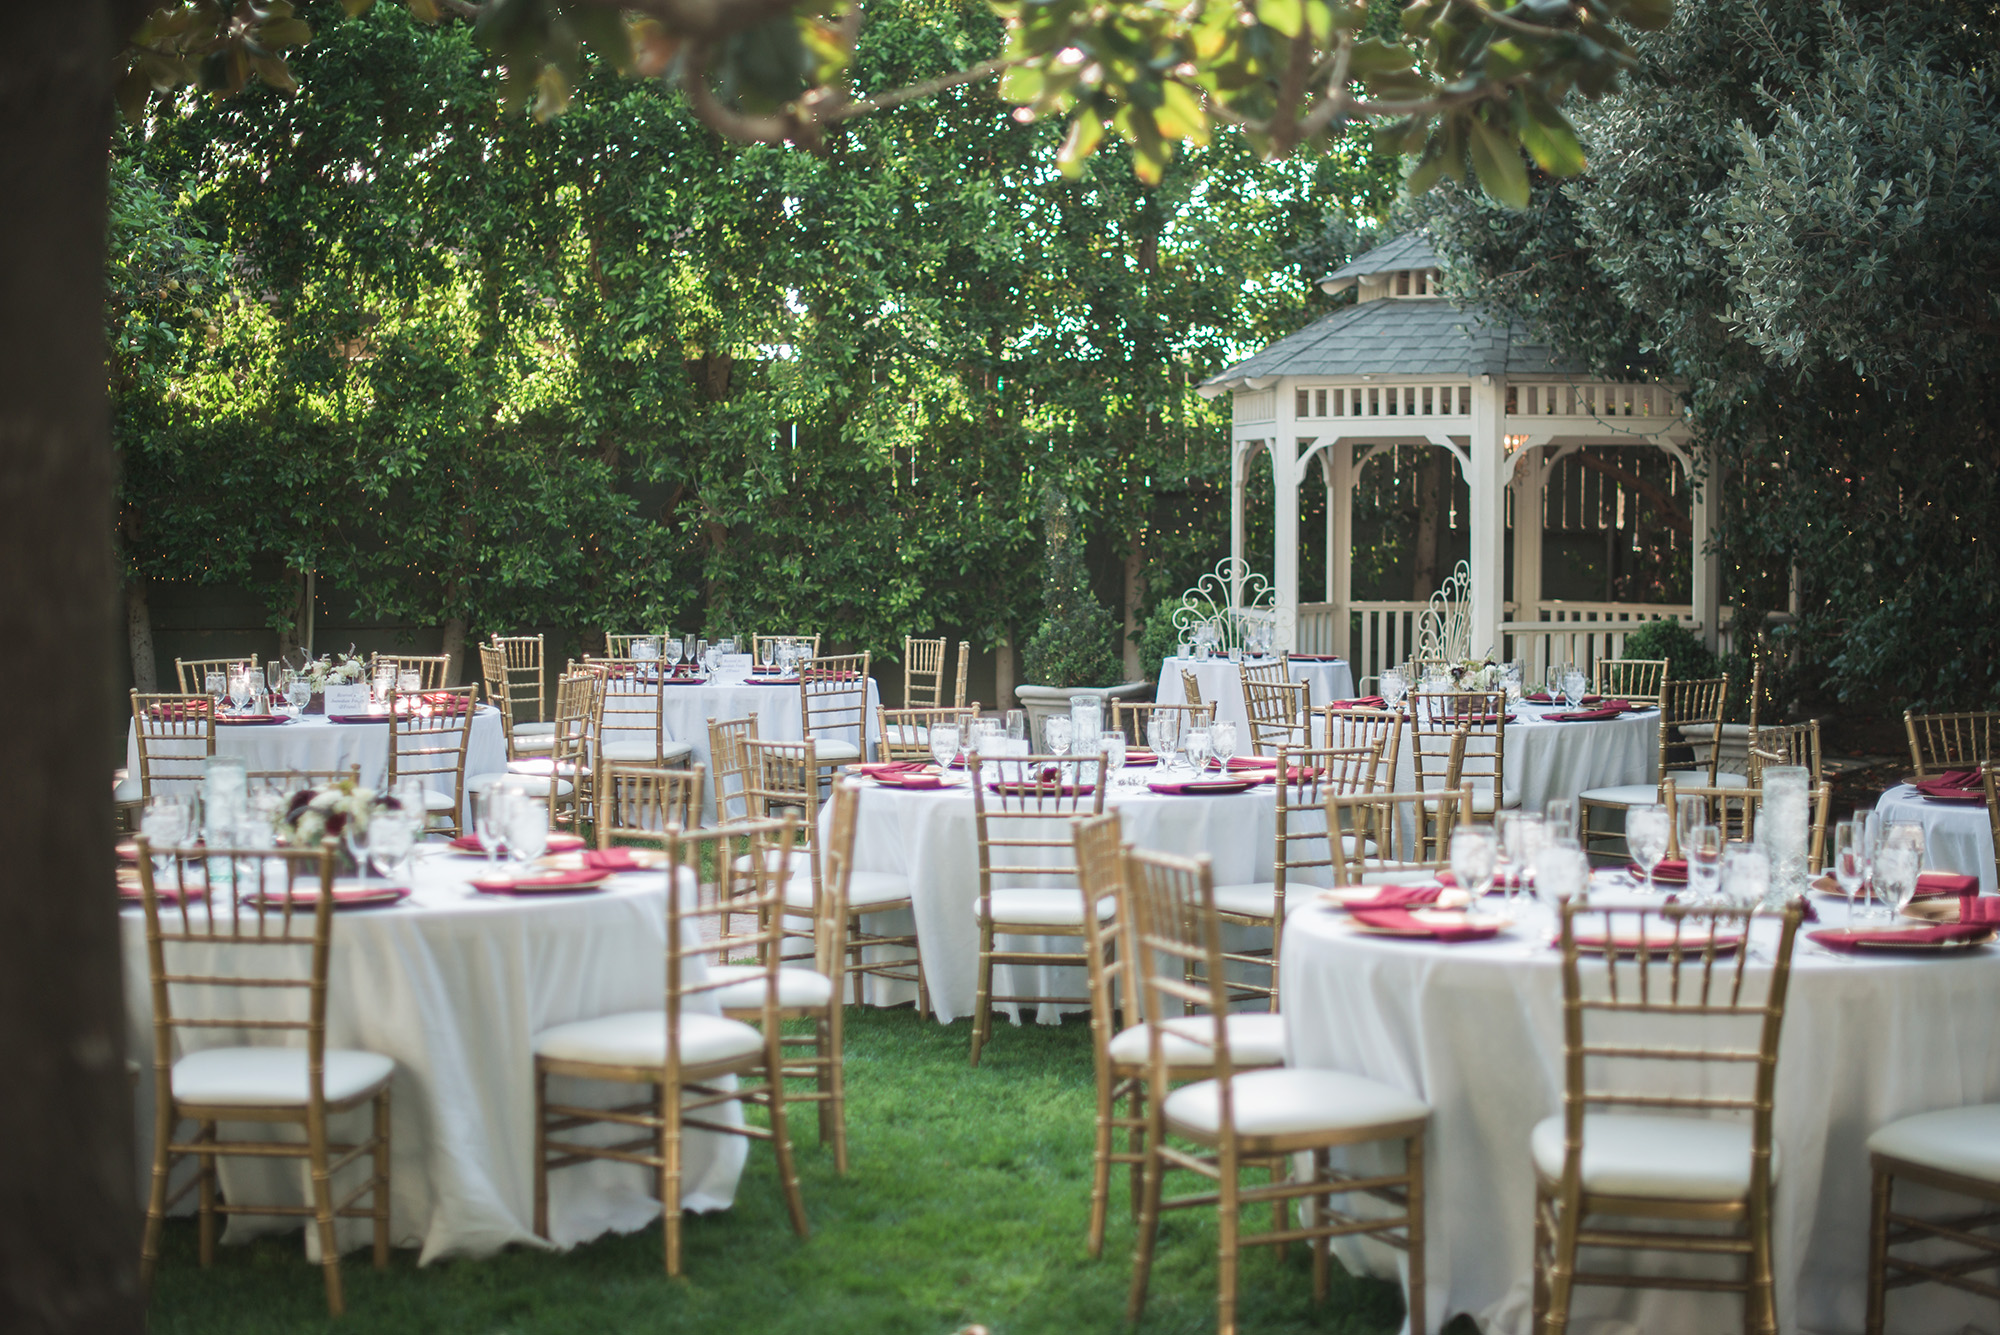 associate-photographer-christmas-house-wedding-carrie-vines-0024.jpg